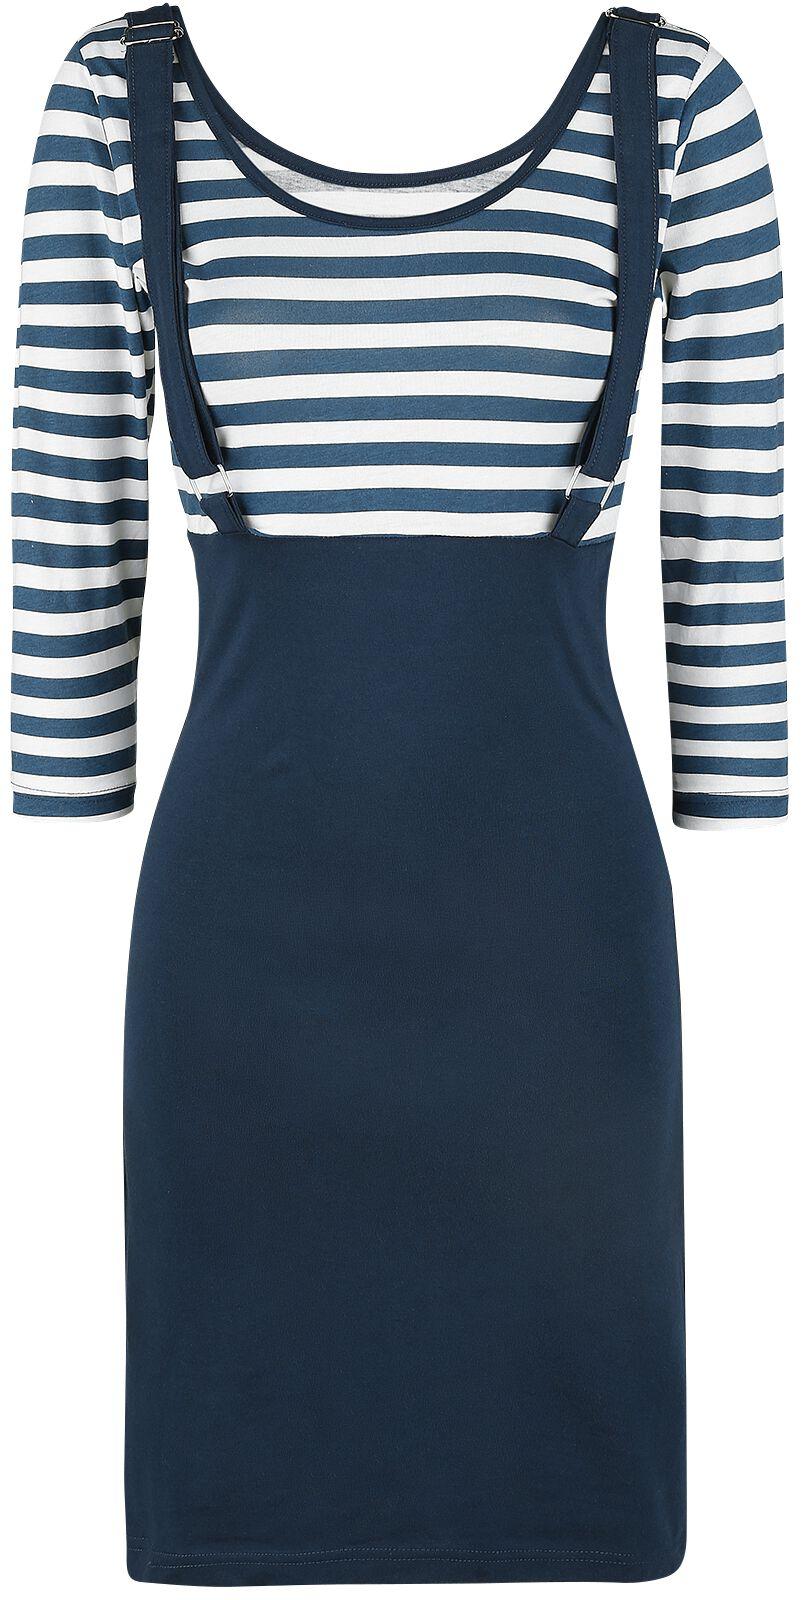 Marki - Sukienki - Sukienka Rockabella Compass Dress Sukienka niebieski/biały - 370182